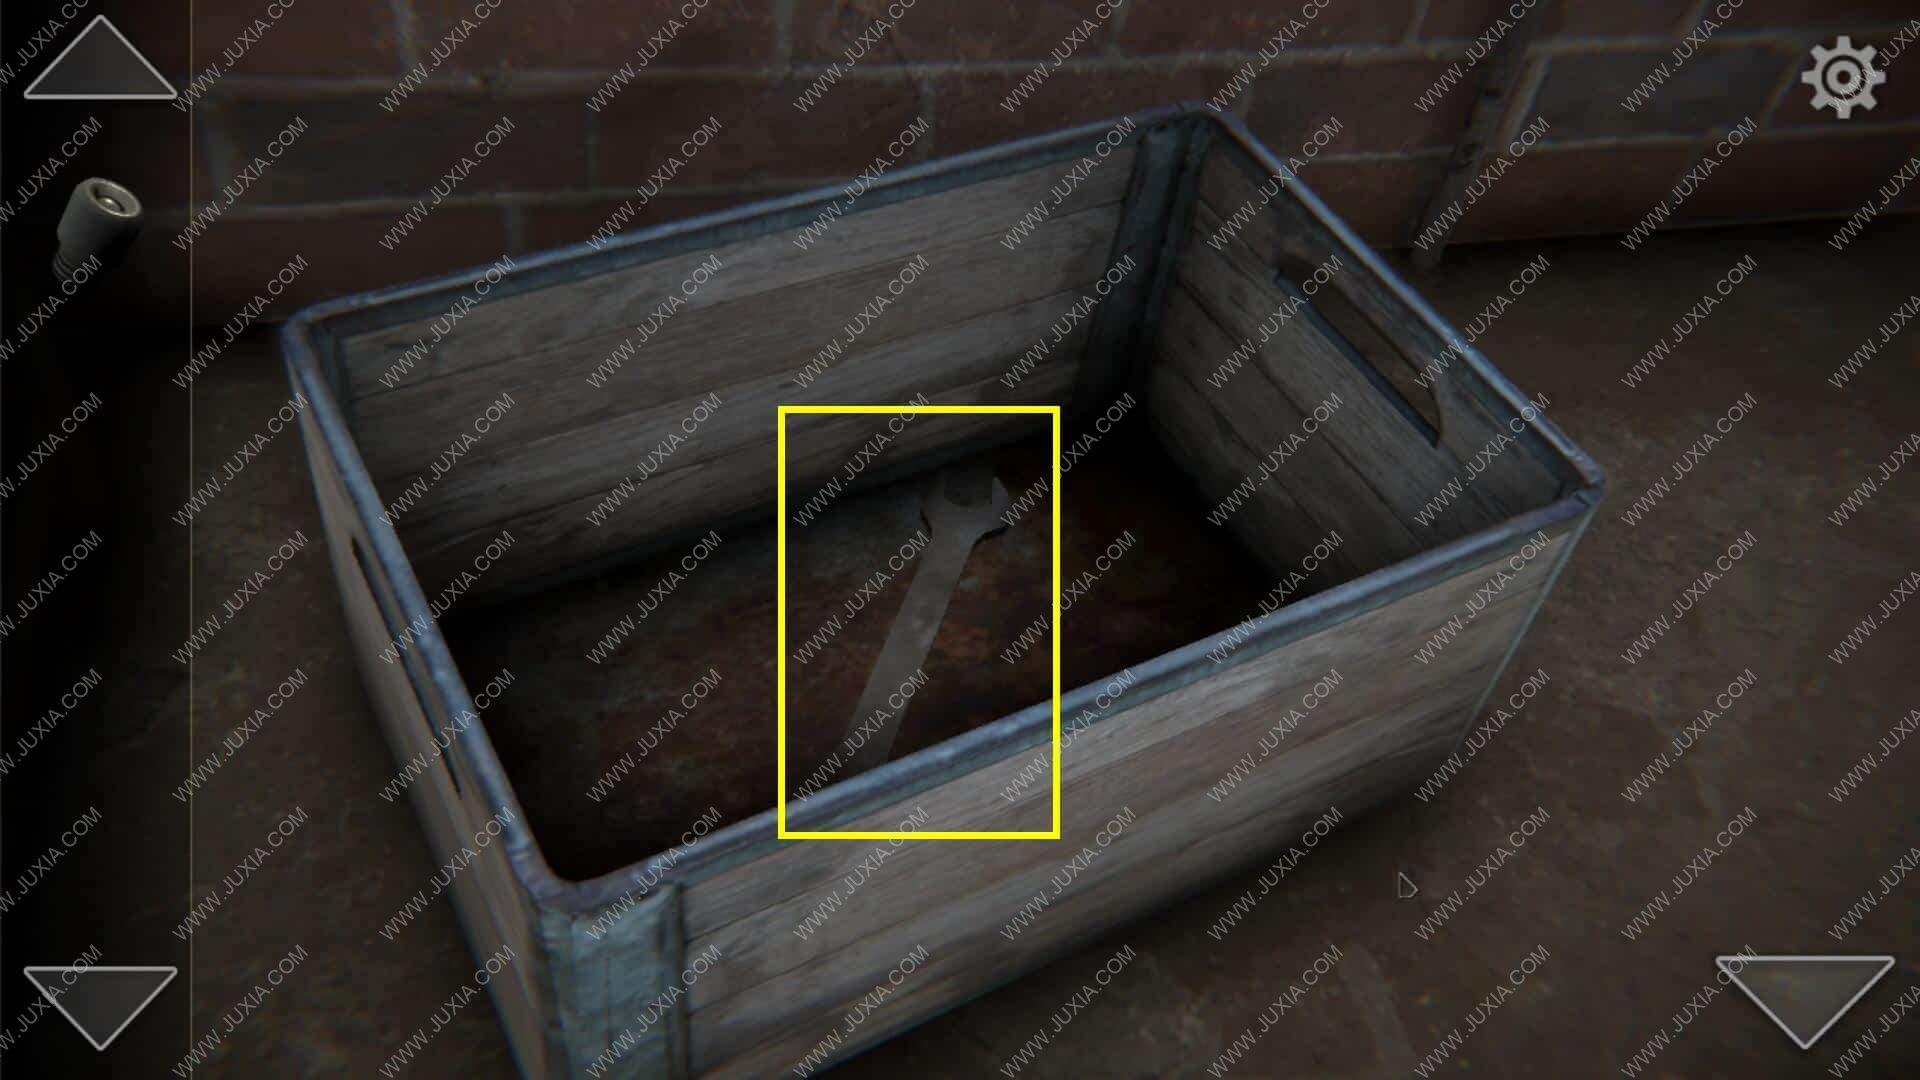 TheEscaper逃脱者攻略第二关 room2修理室铁箱怎么过